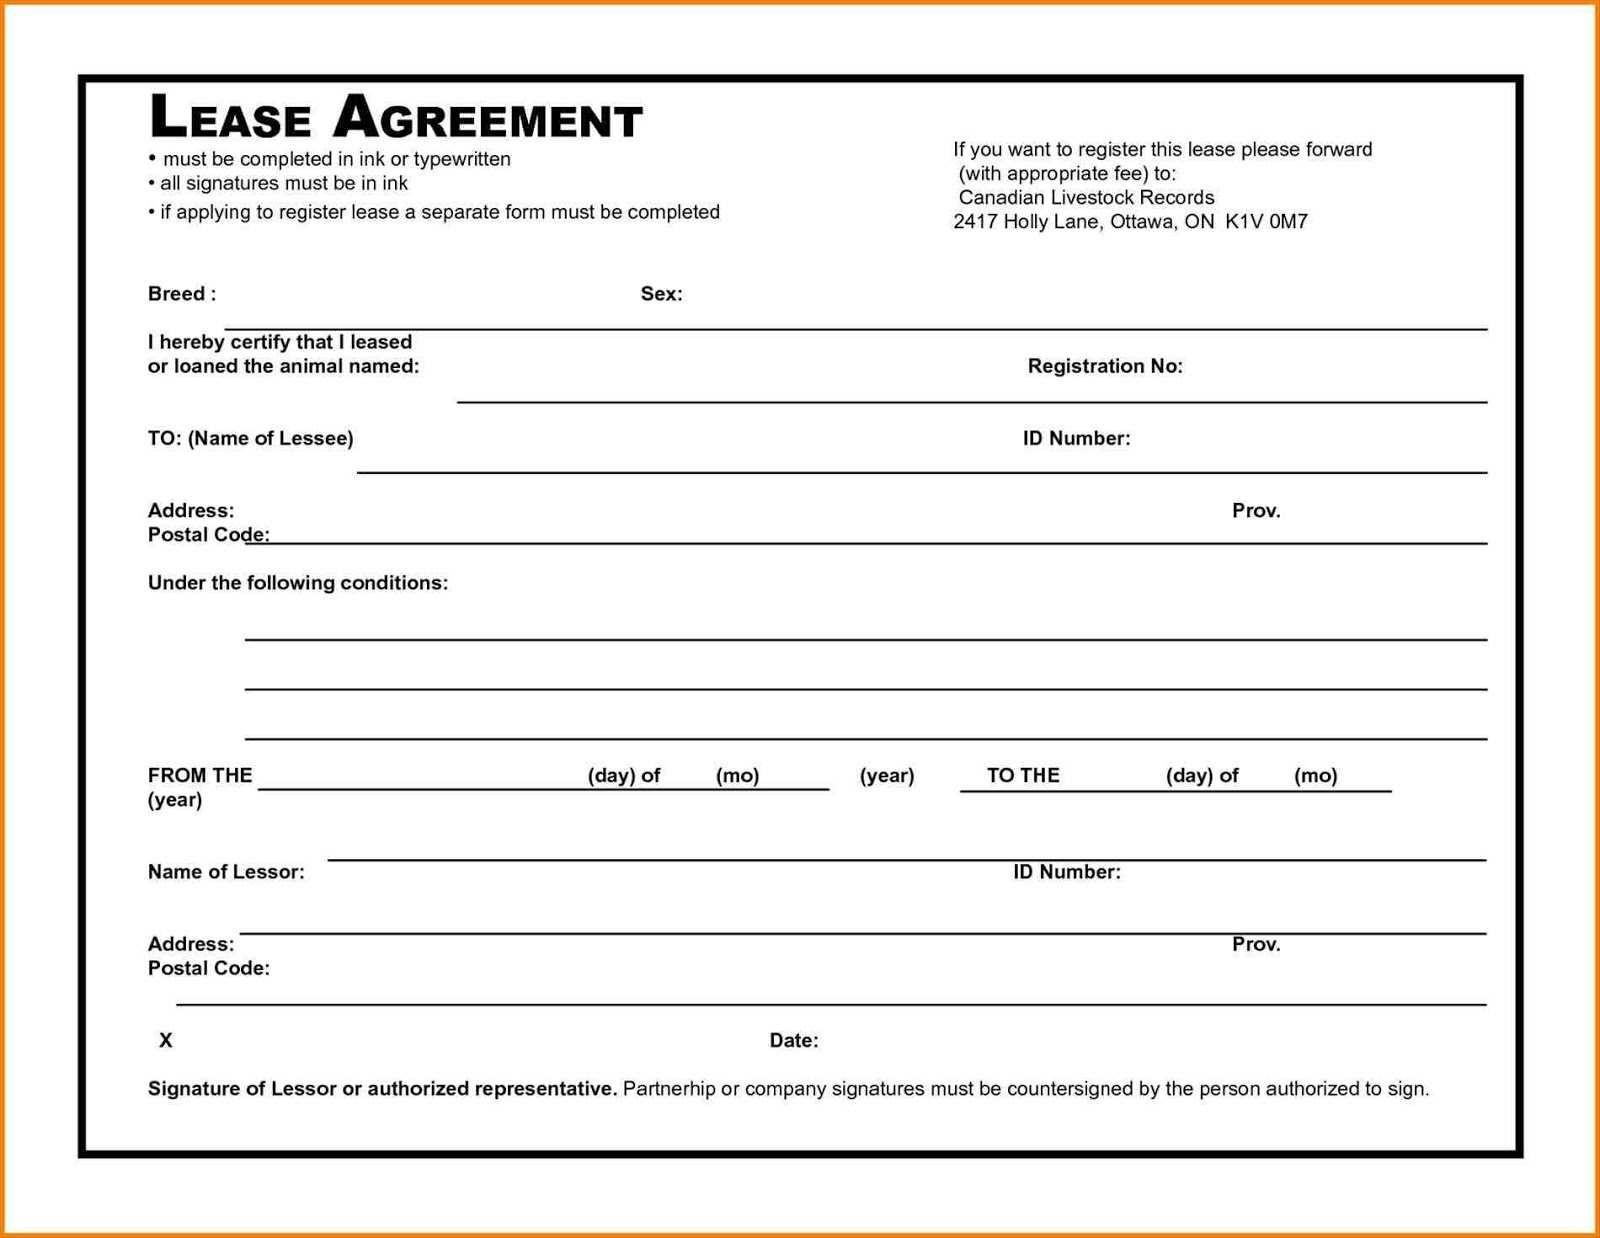 Very Basic Rental Agreement 5202 Free Printable Basic Rental - Free Printable Basic Rental Agreement